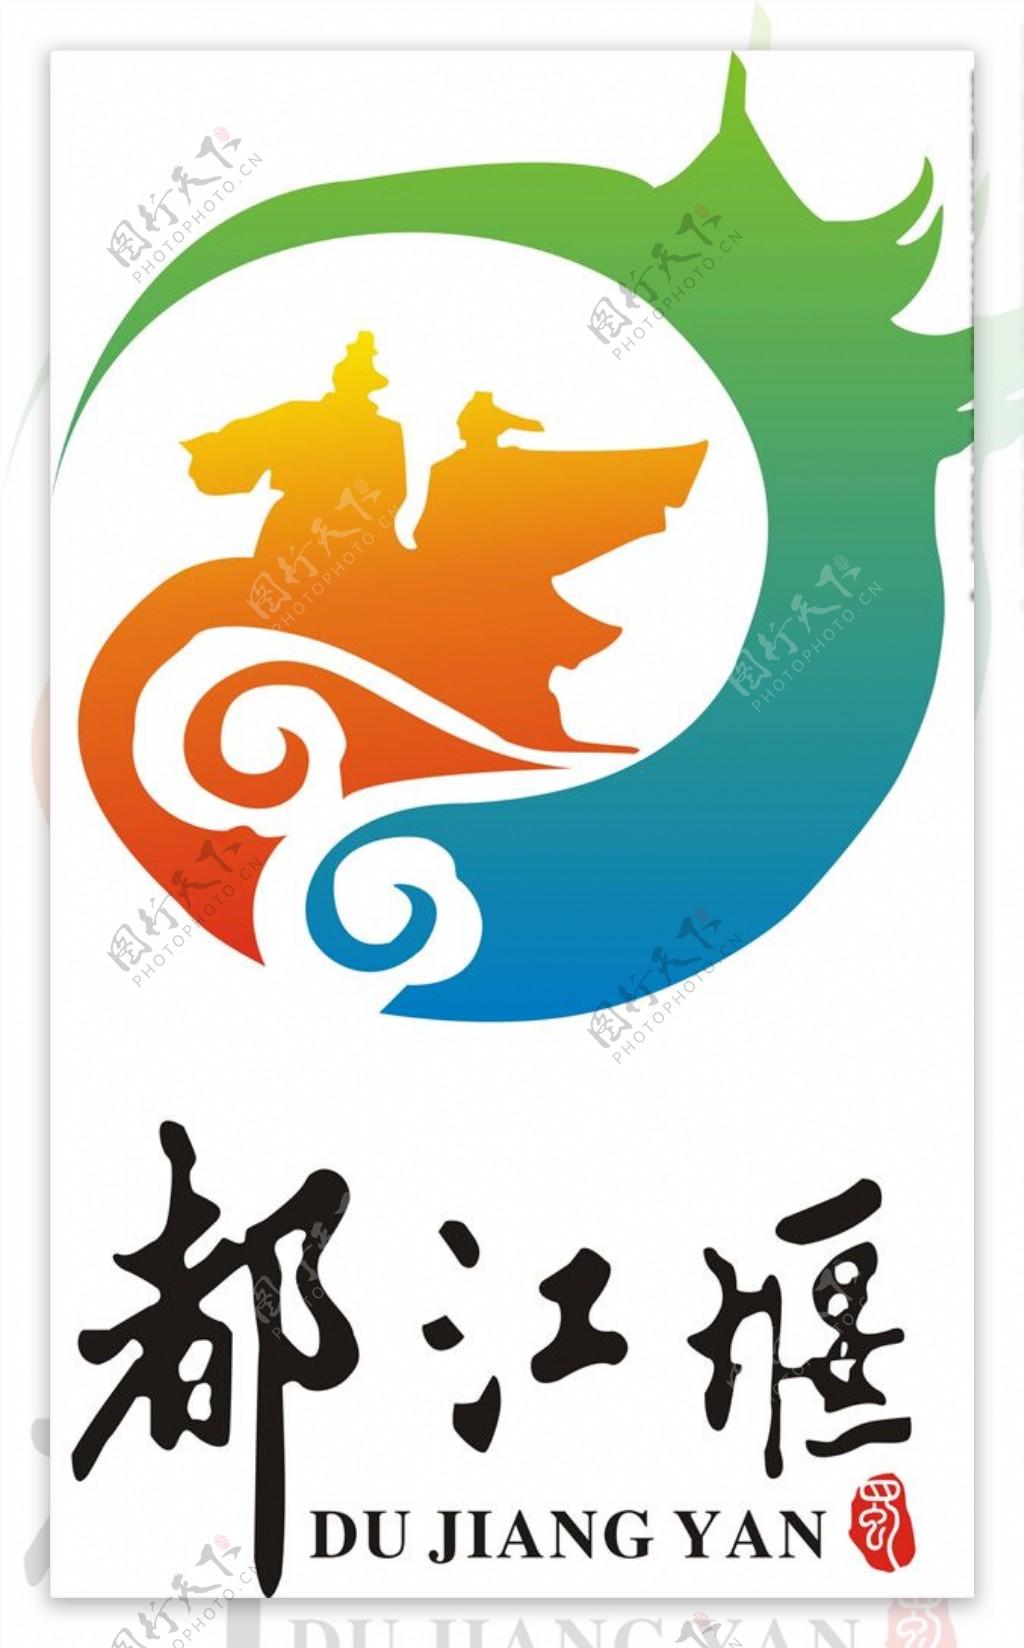 都江堰LOGO